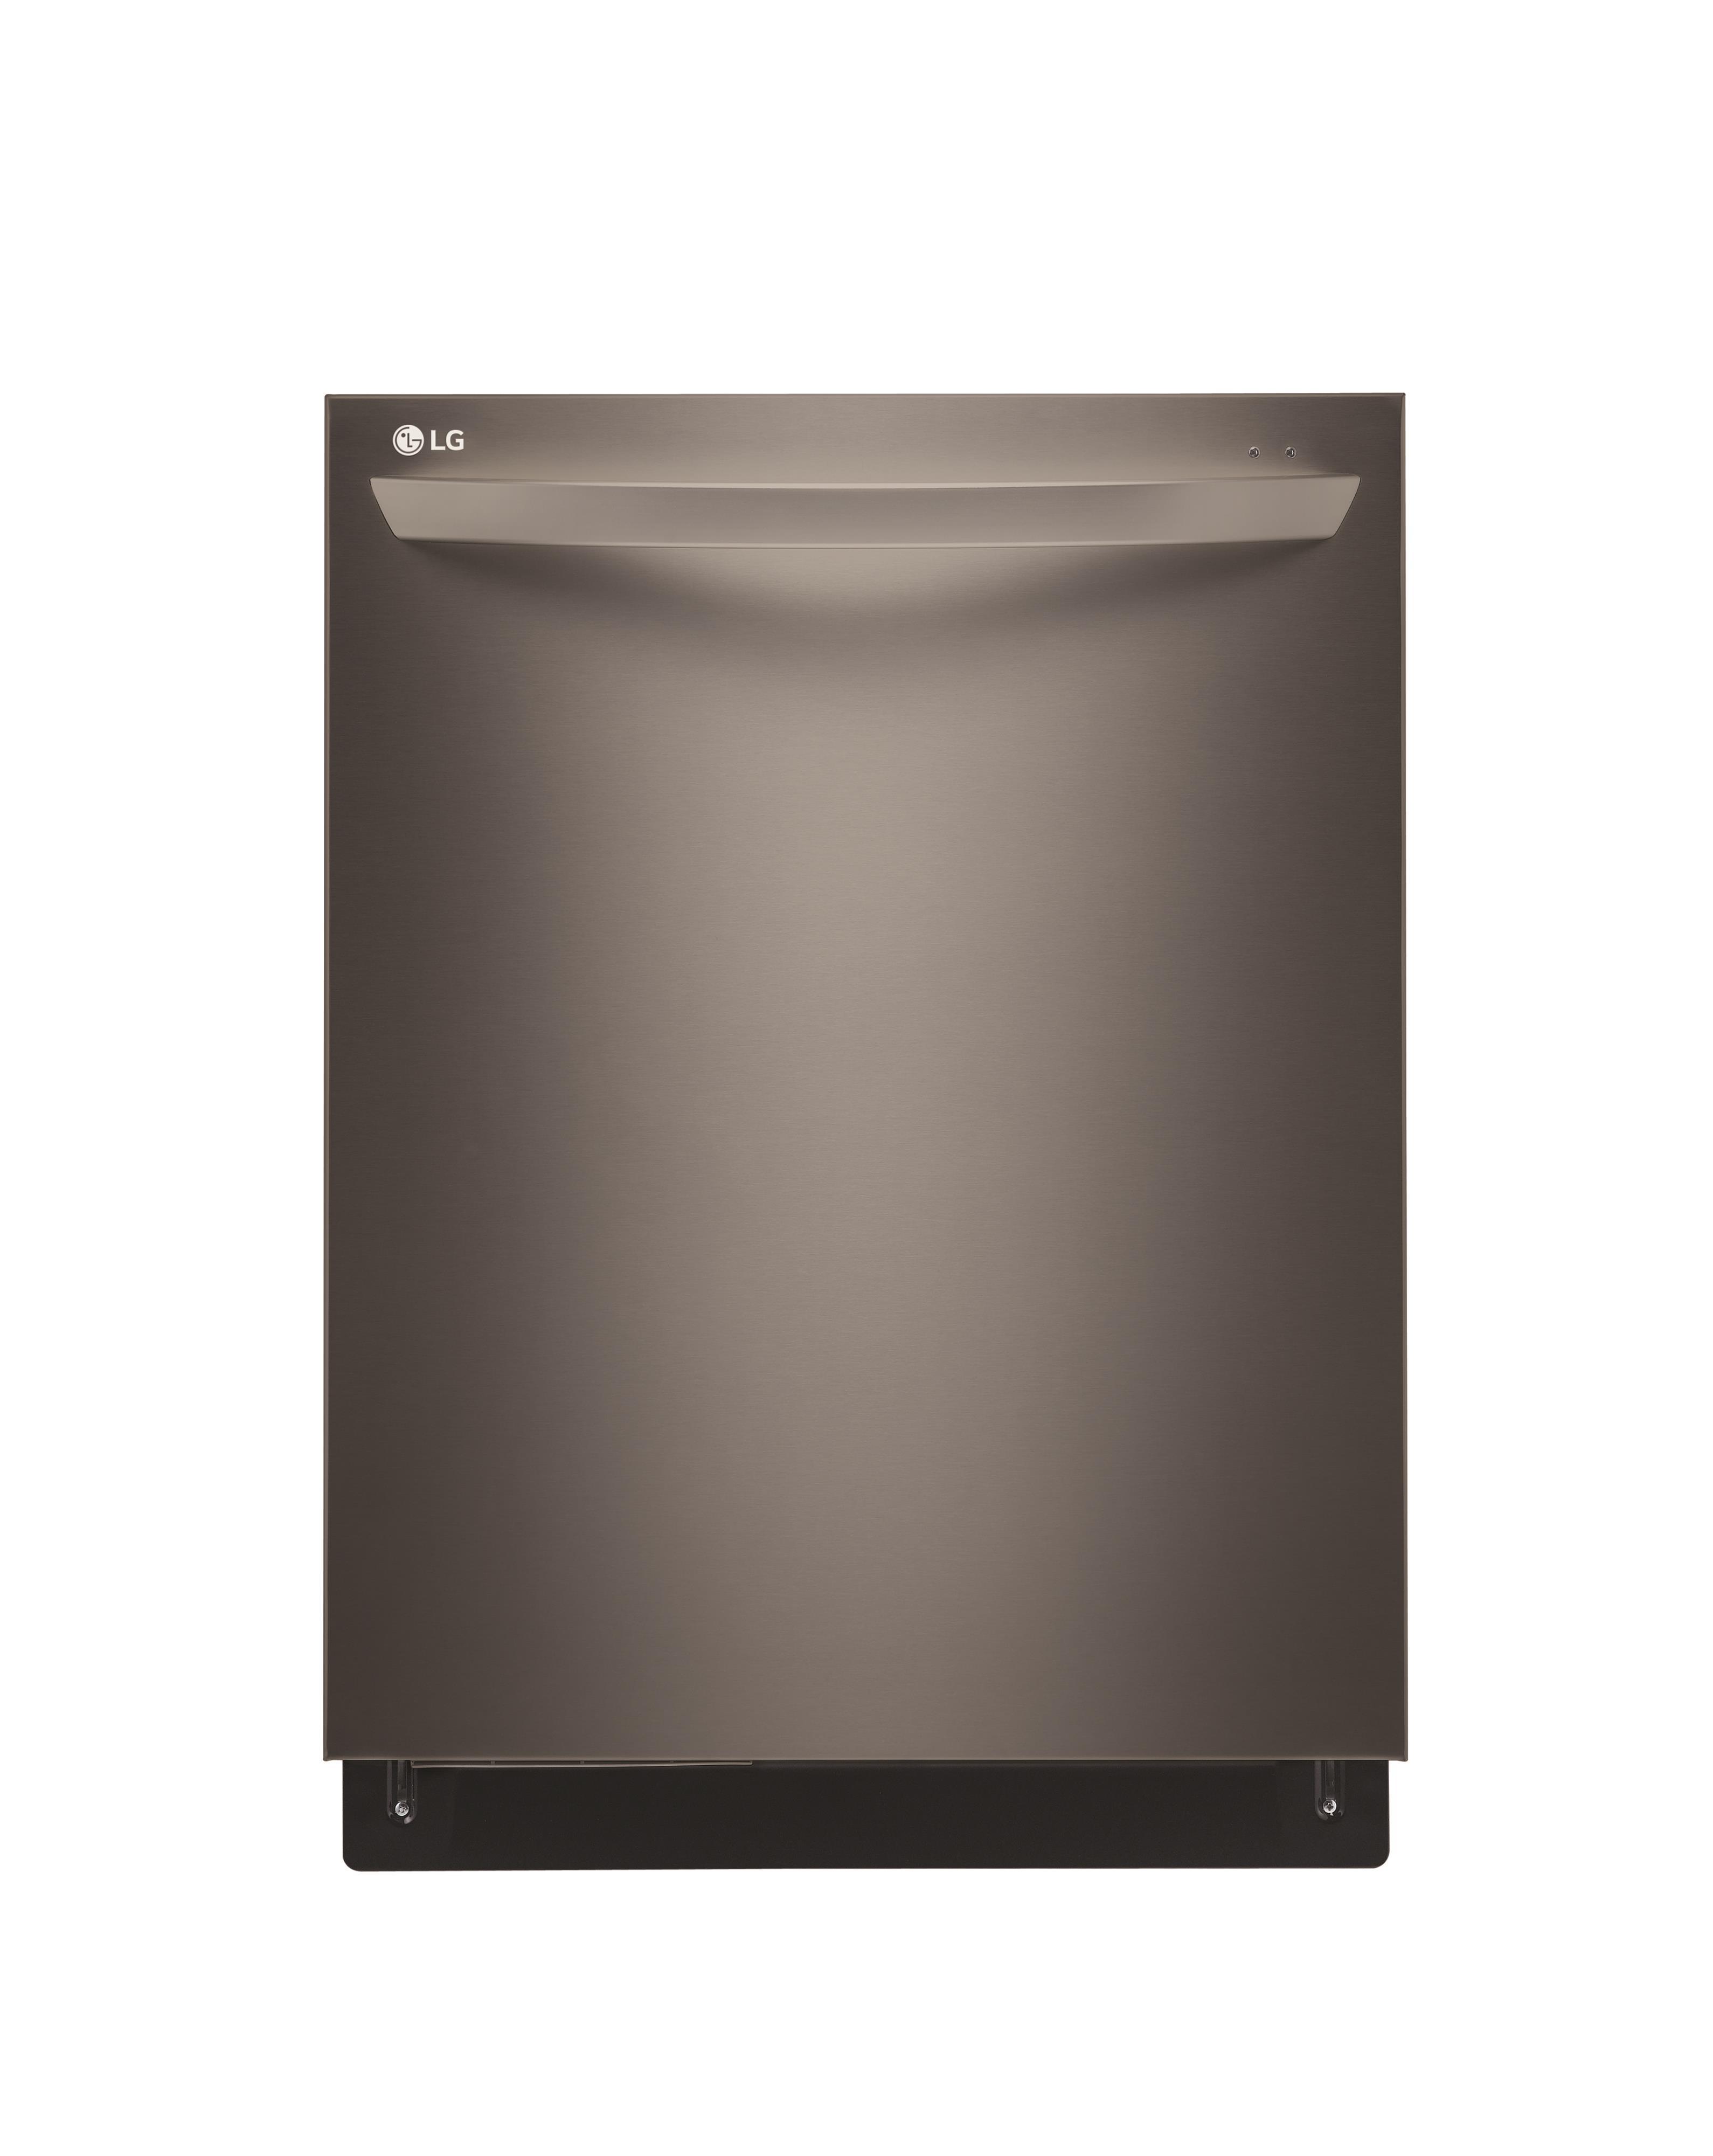 LG Appliances Dishwashers- LG Fully Integrated Dishwasher - Item Number: LDF7774BD